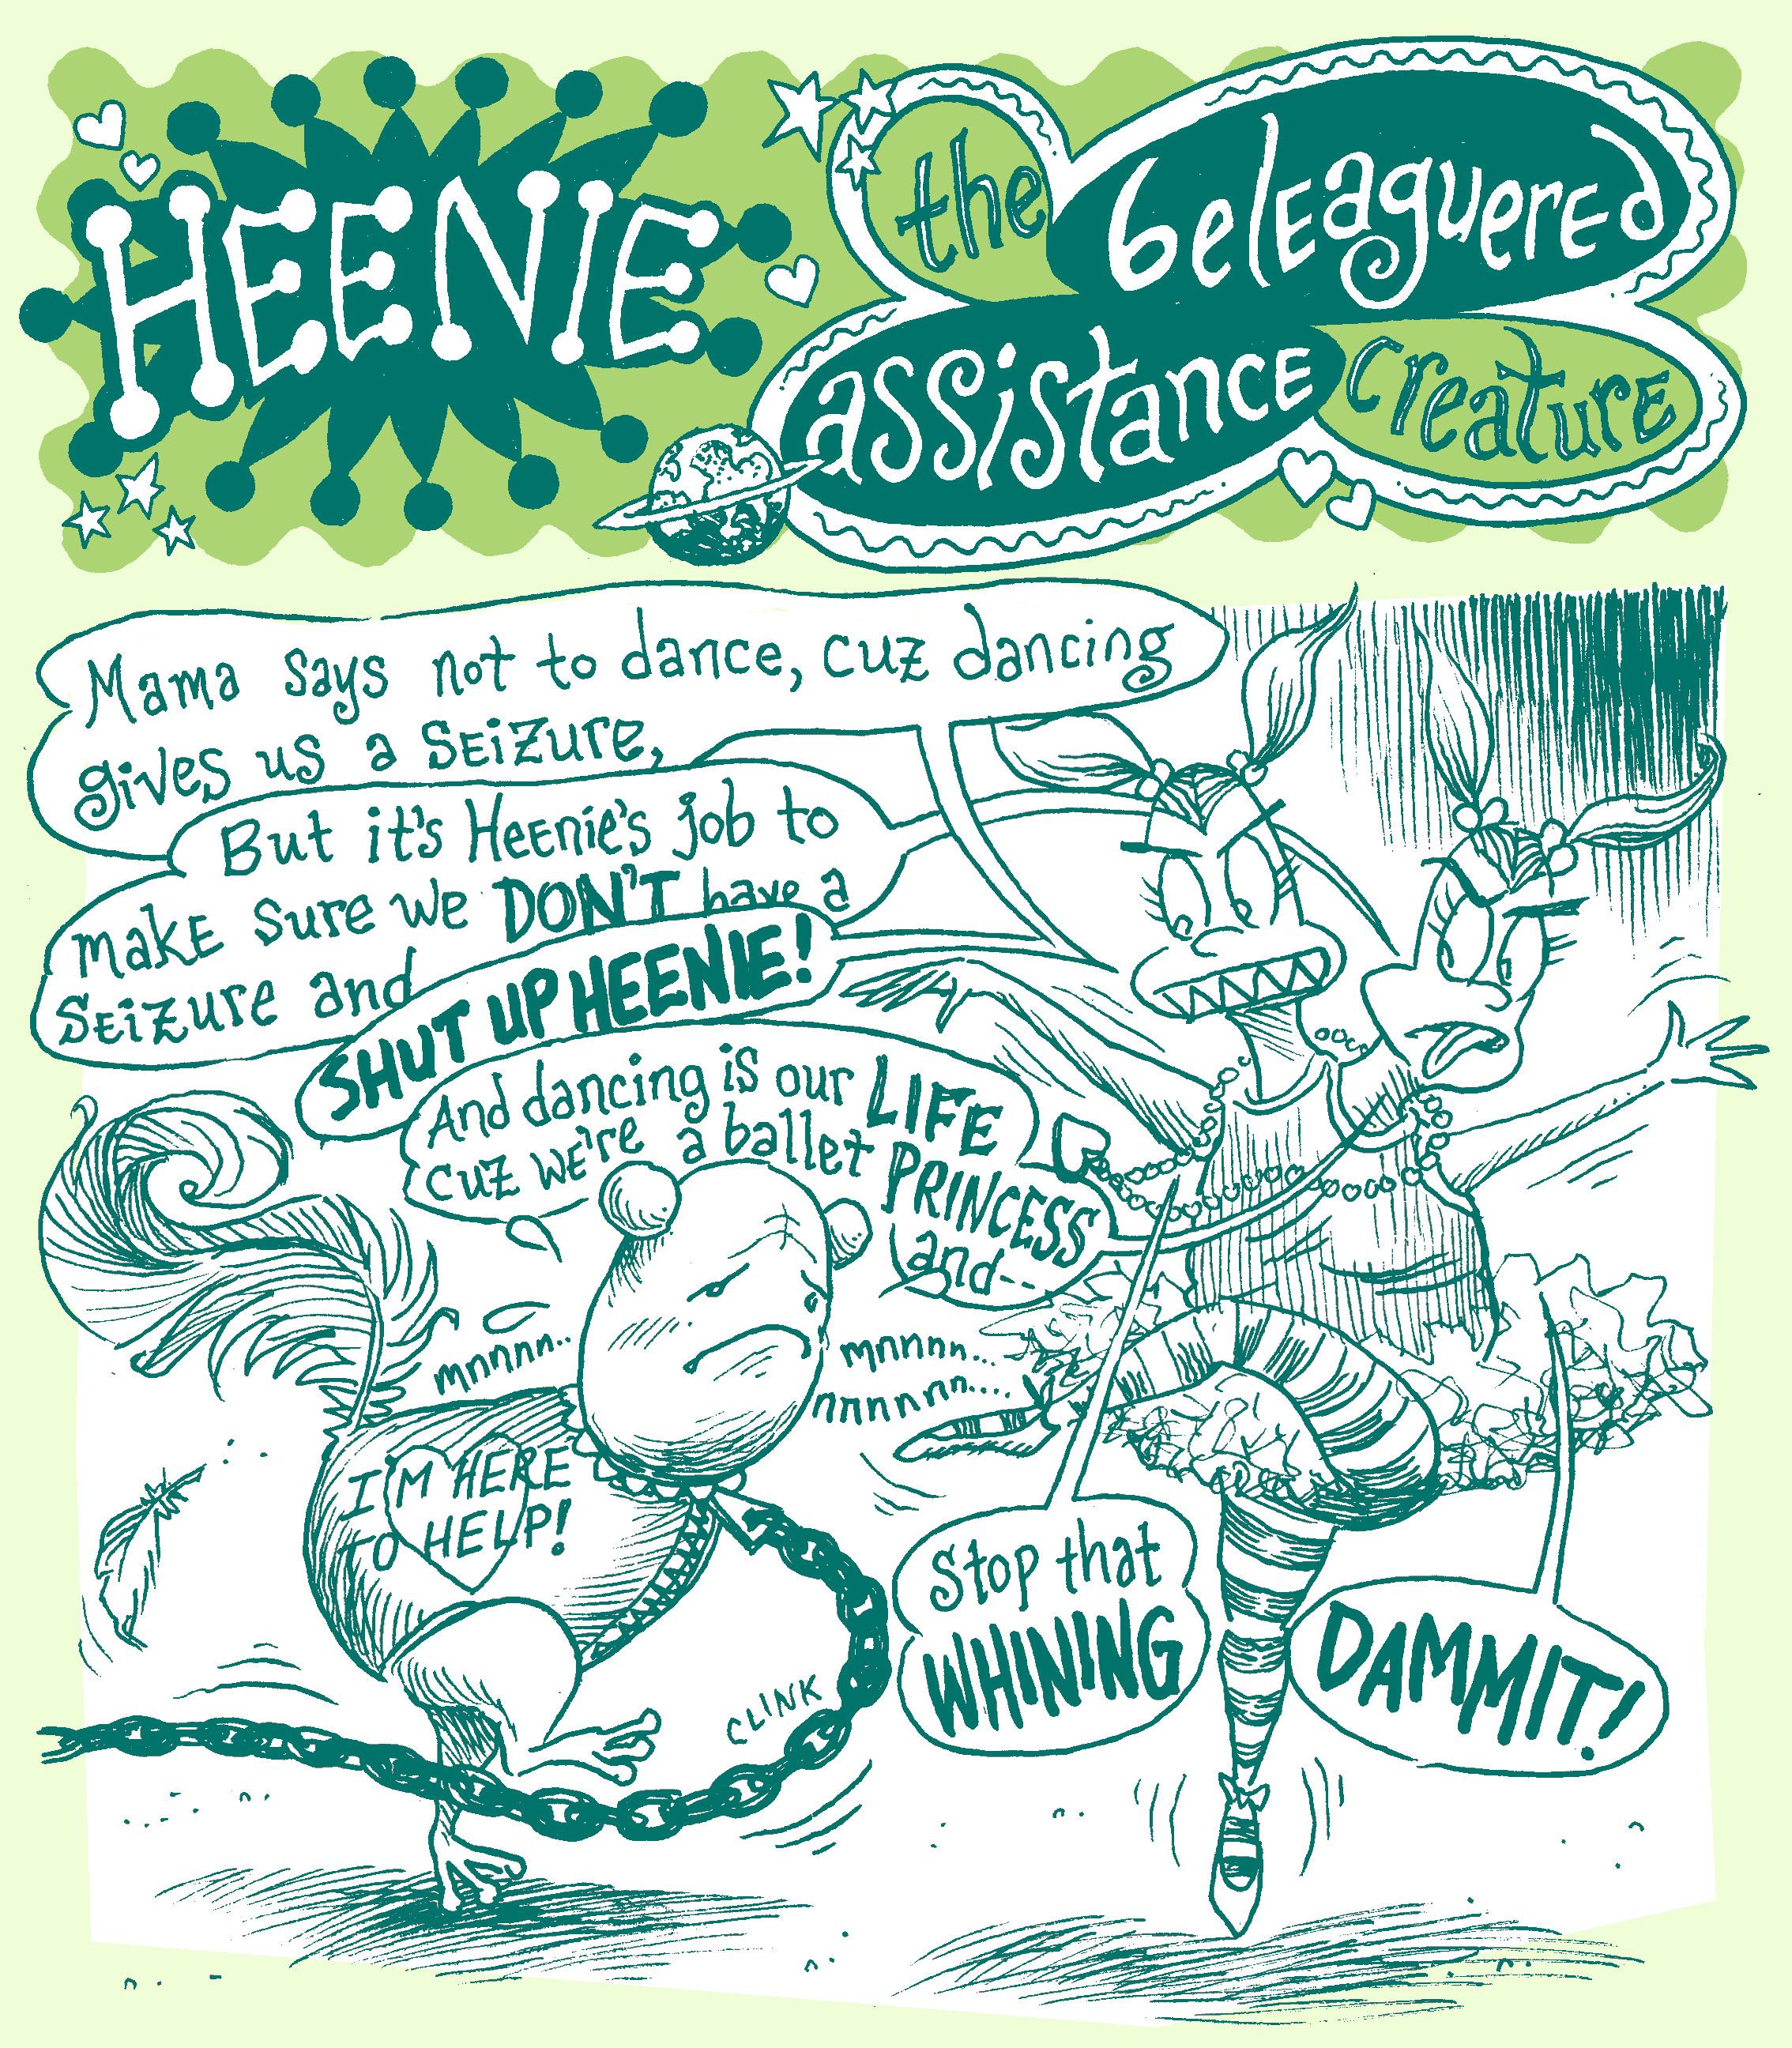 Heenie (page 1 of 4)